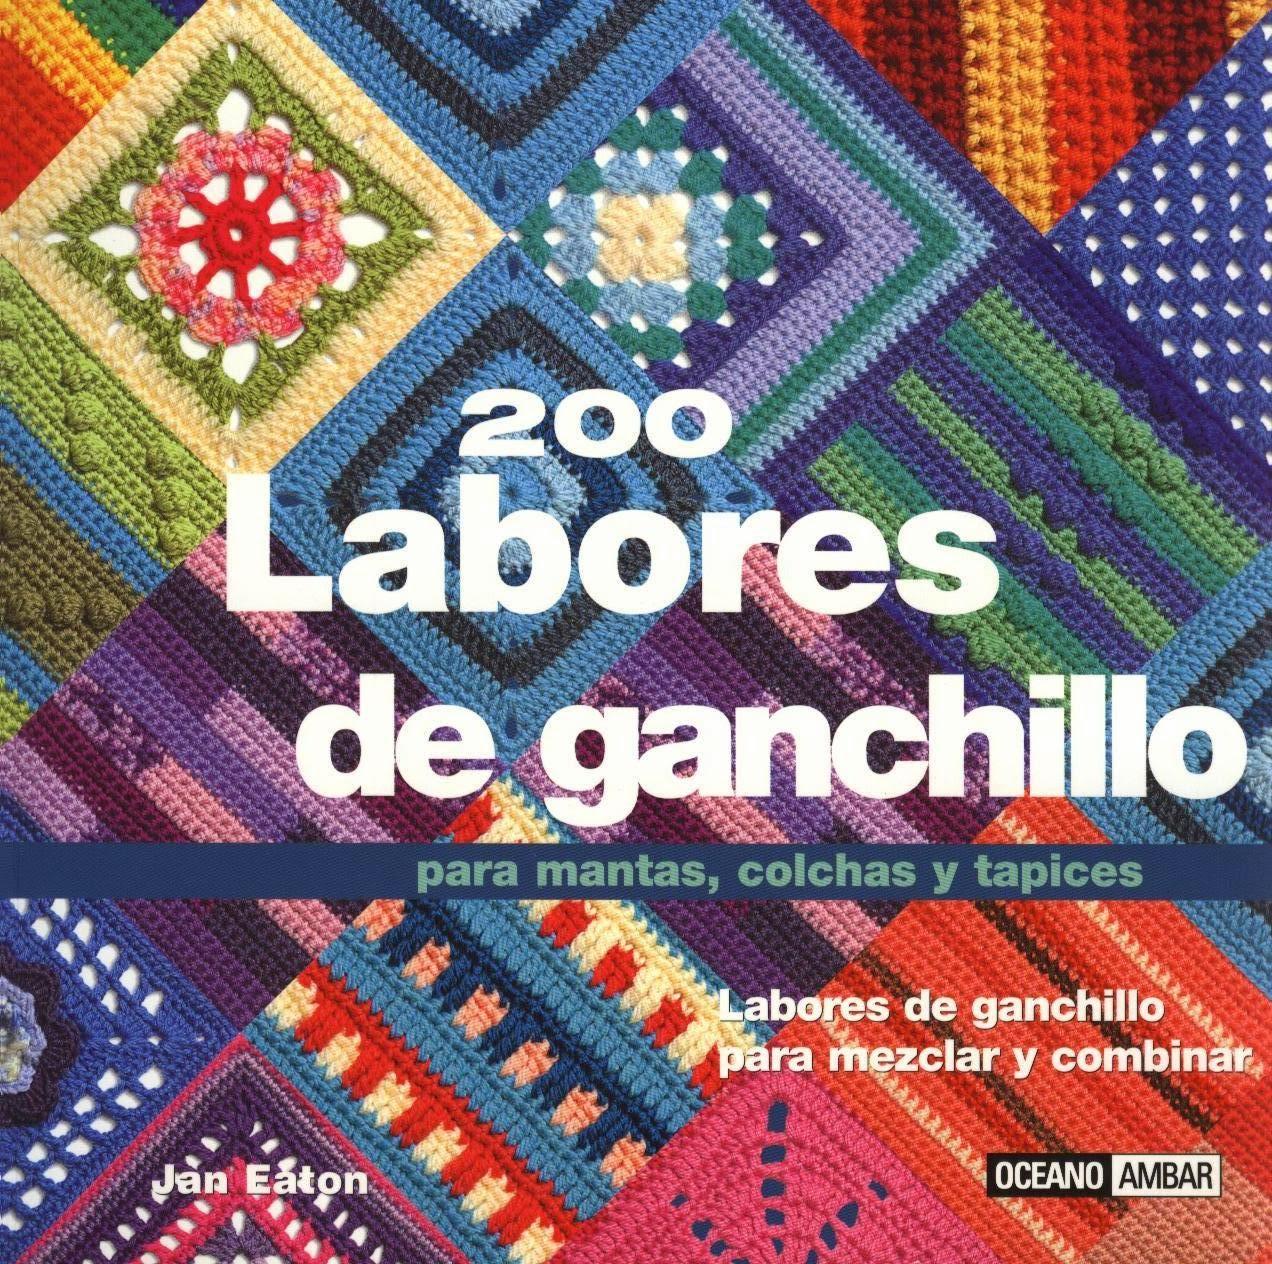 ZONA DE GANCHILLO